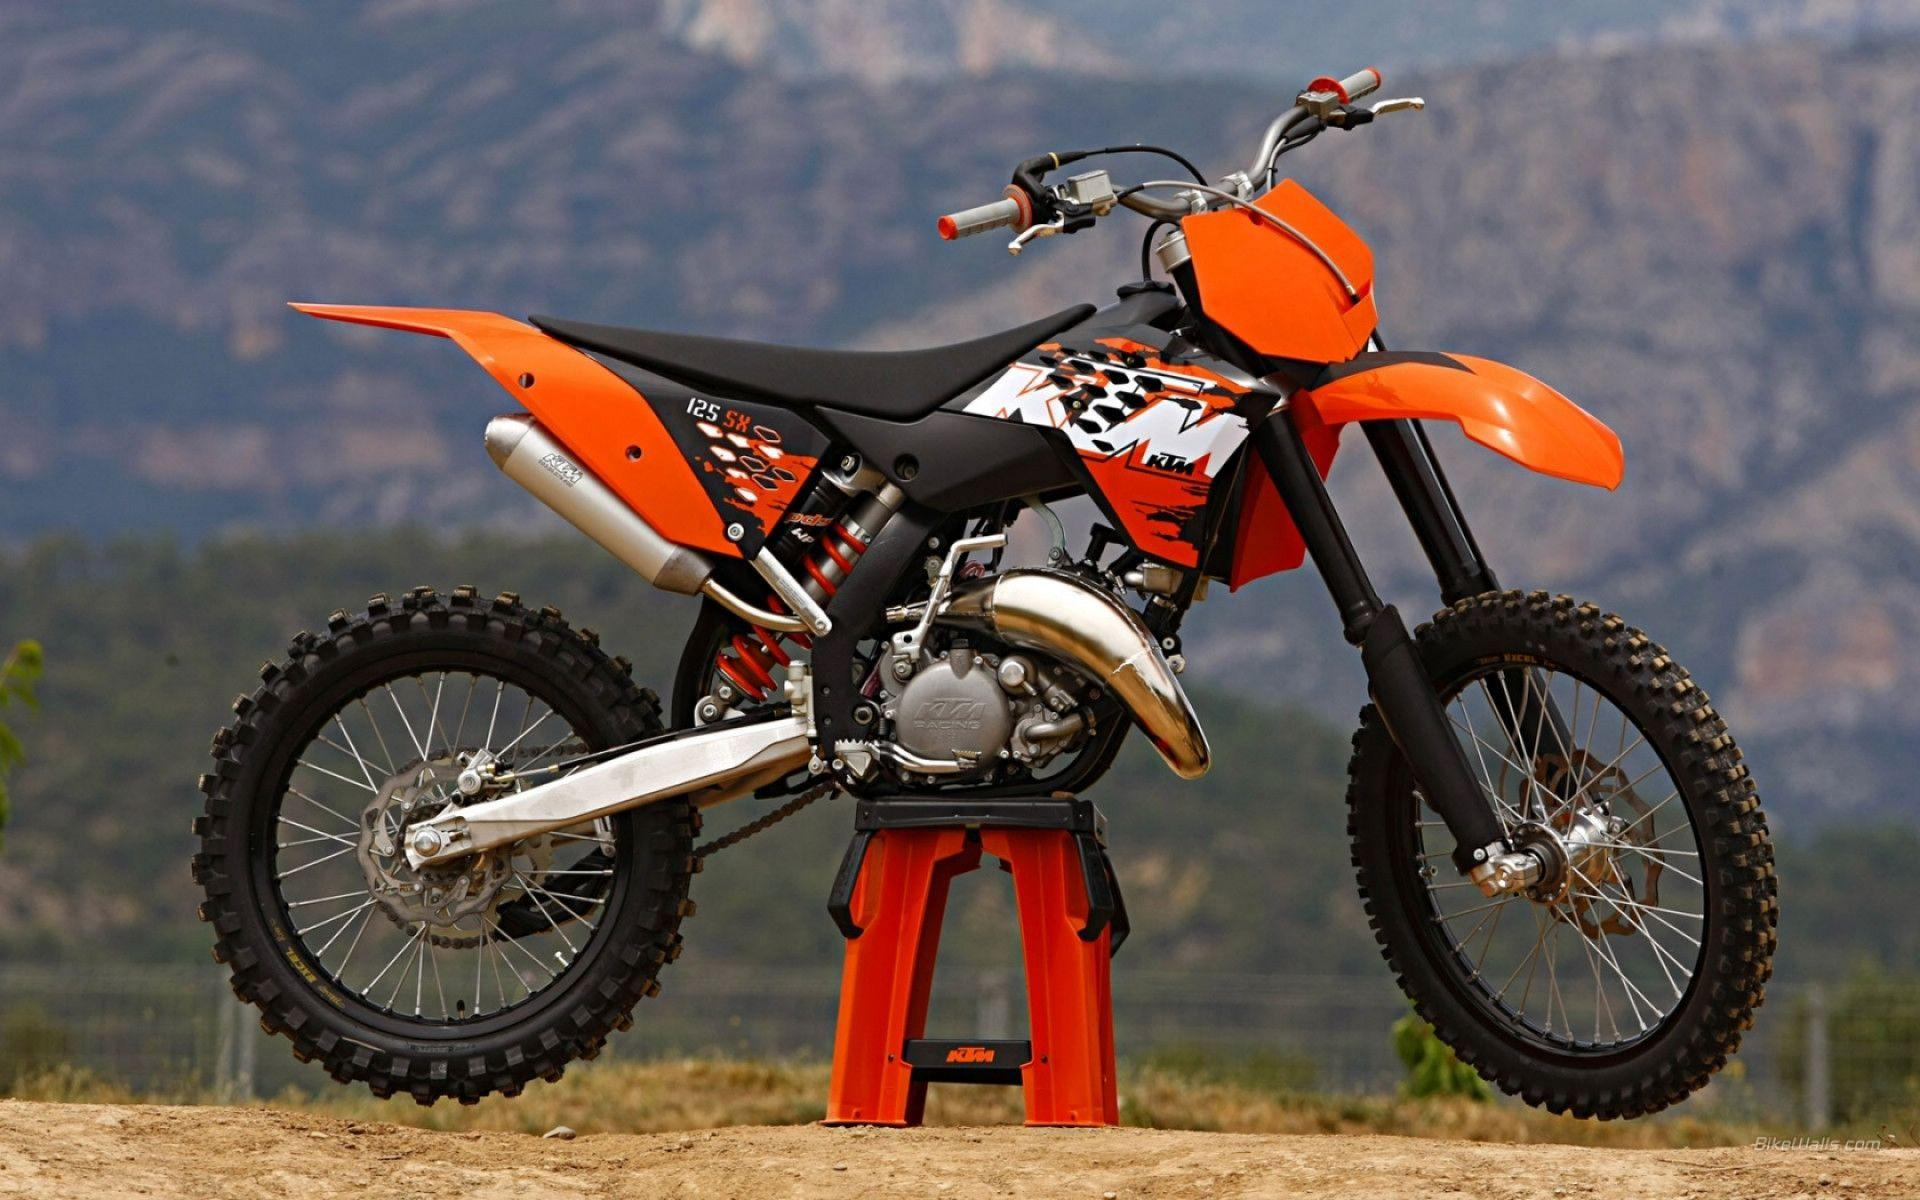 Motocross Bikes Wallpapers Hd 17854 Full HD Wallpaper Desktop